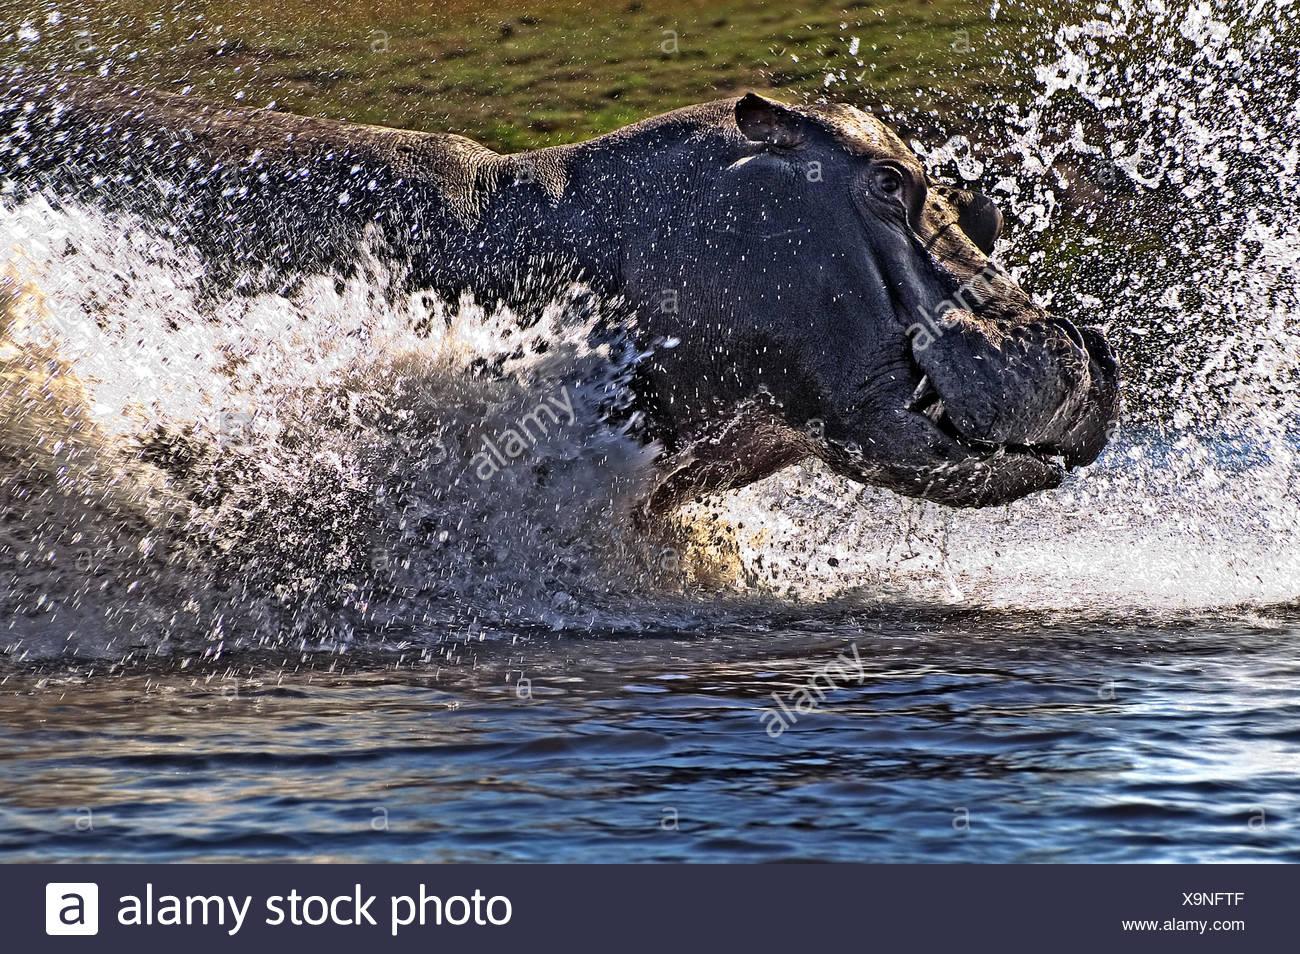 hippo attack Stock Photo: 281371231 - Alamy